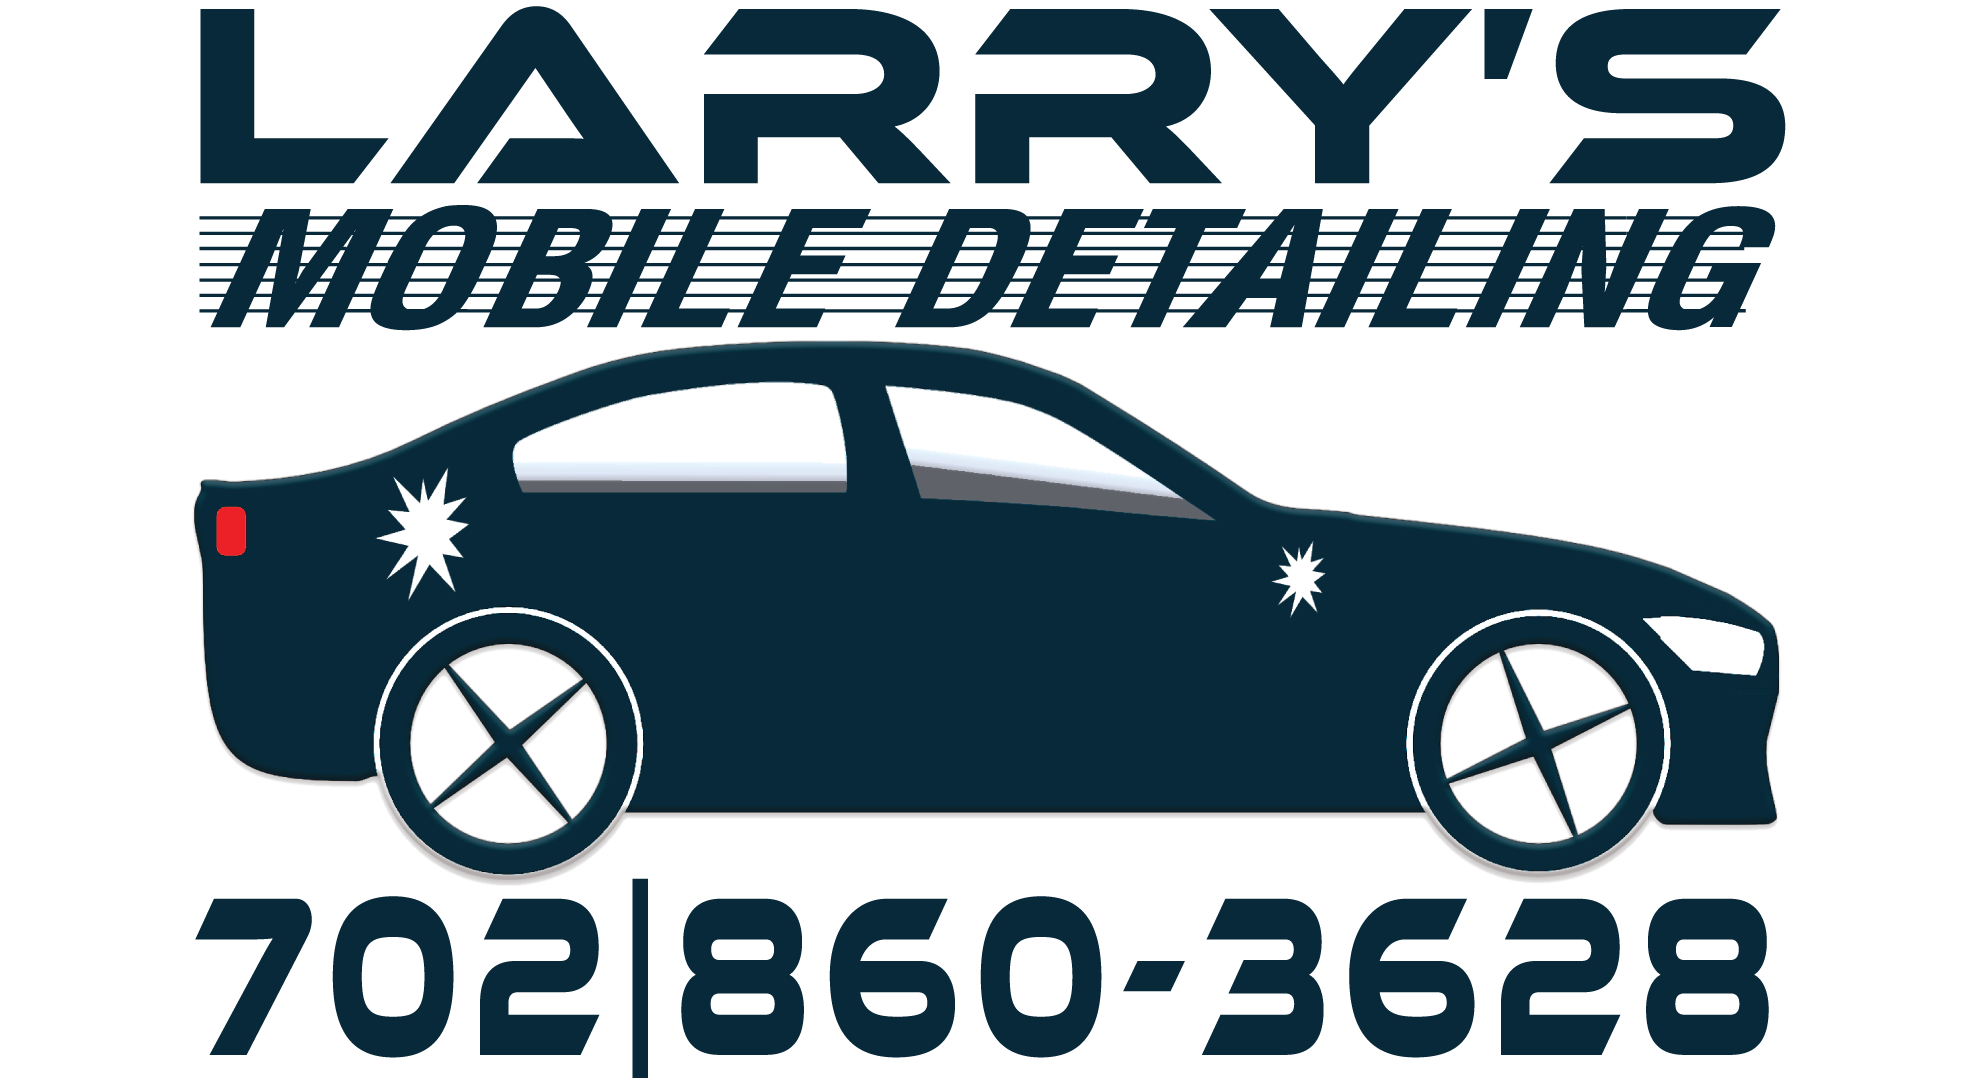 Larry's Mobile Detailing - Nevada